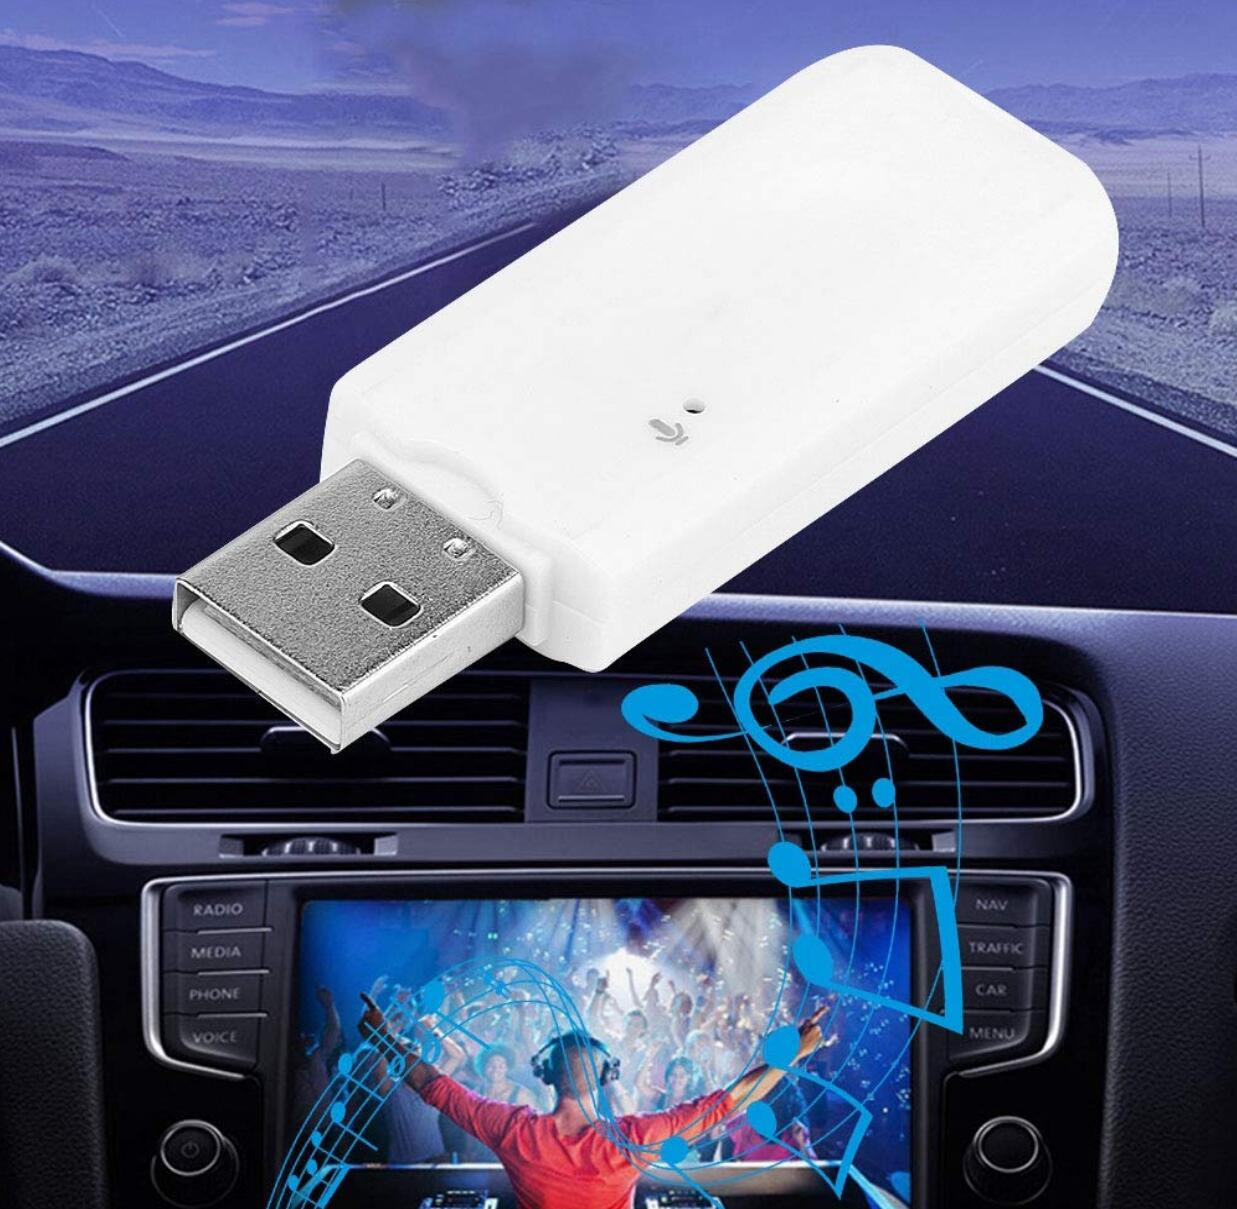 Adaptador receptor de Audio inalámbrico por Bluetooth con USB para chrysler 300c passat b5 fiat panda golf 5 gti peugeot 308 saab mercedes